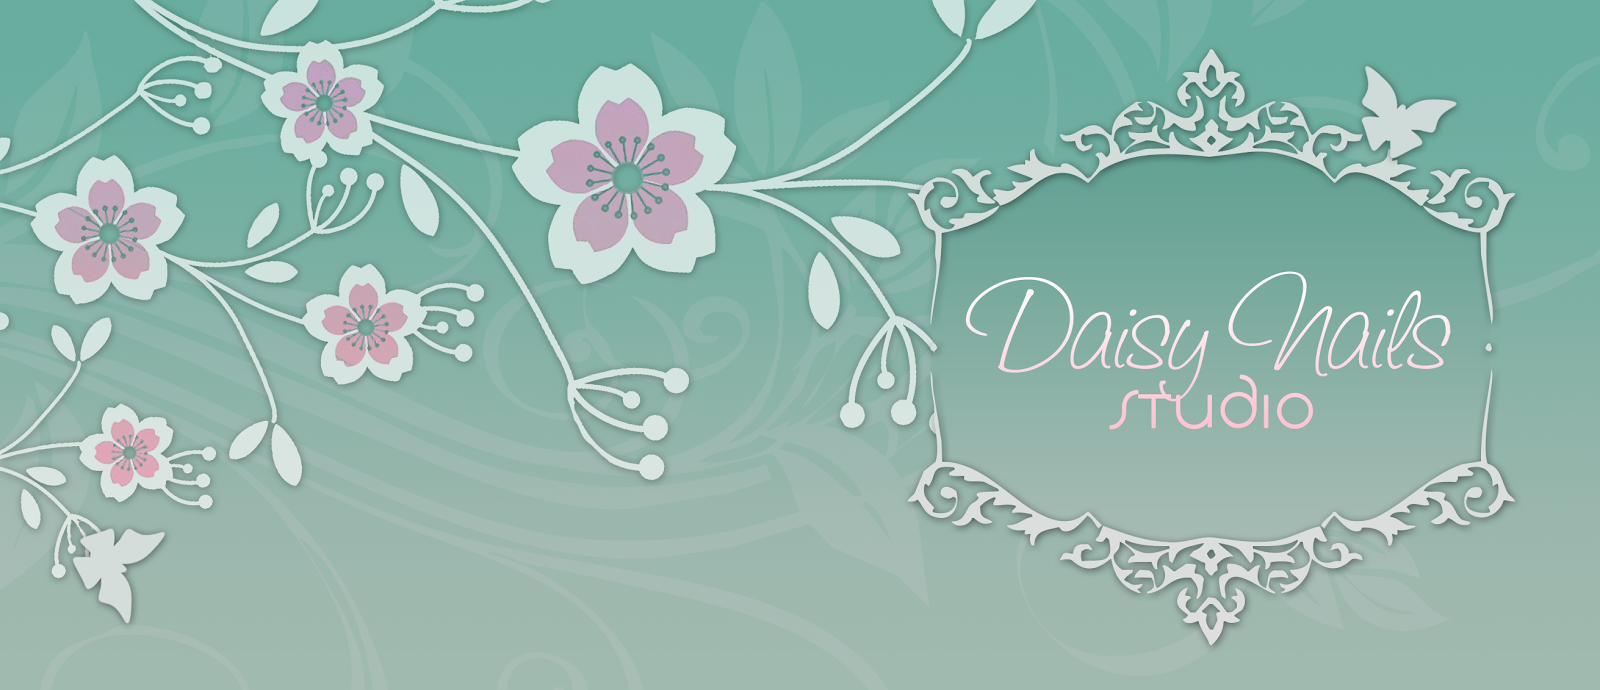 DaisyNails   Studio